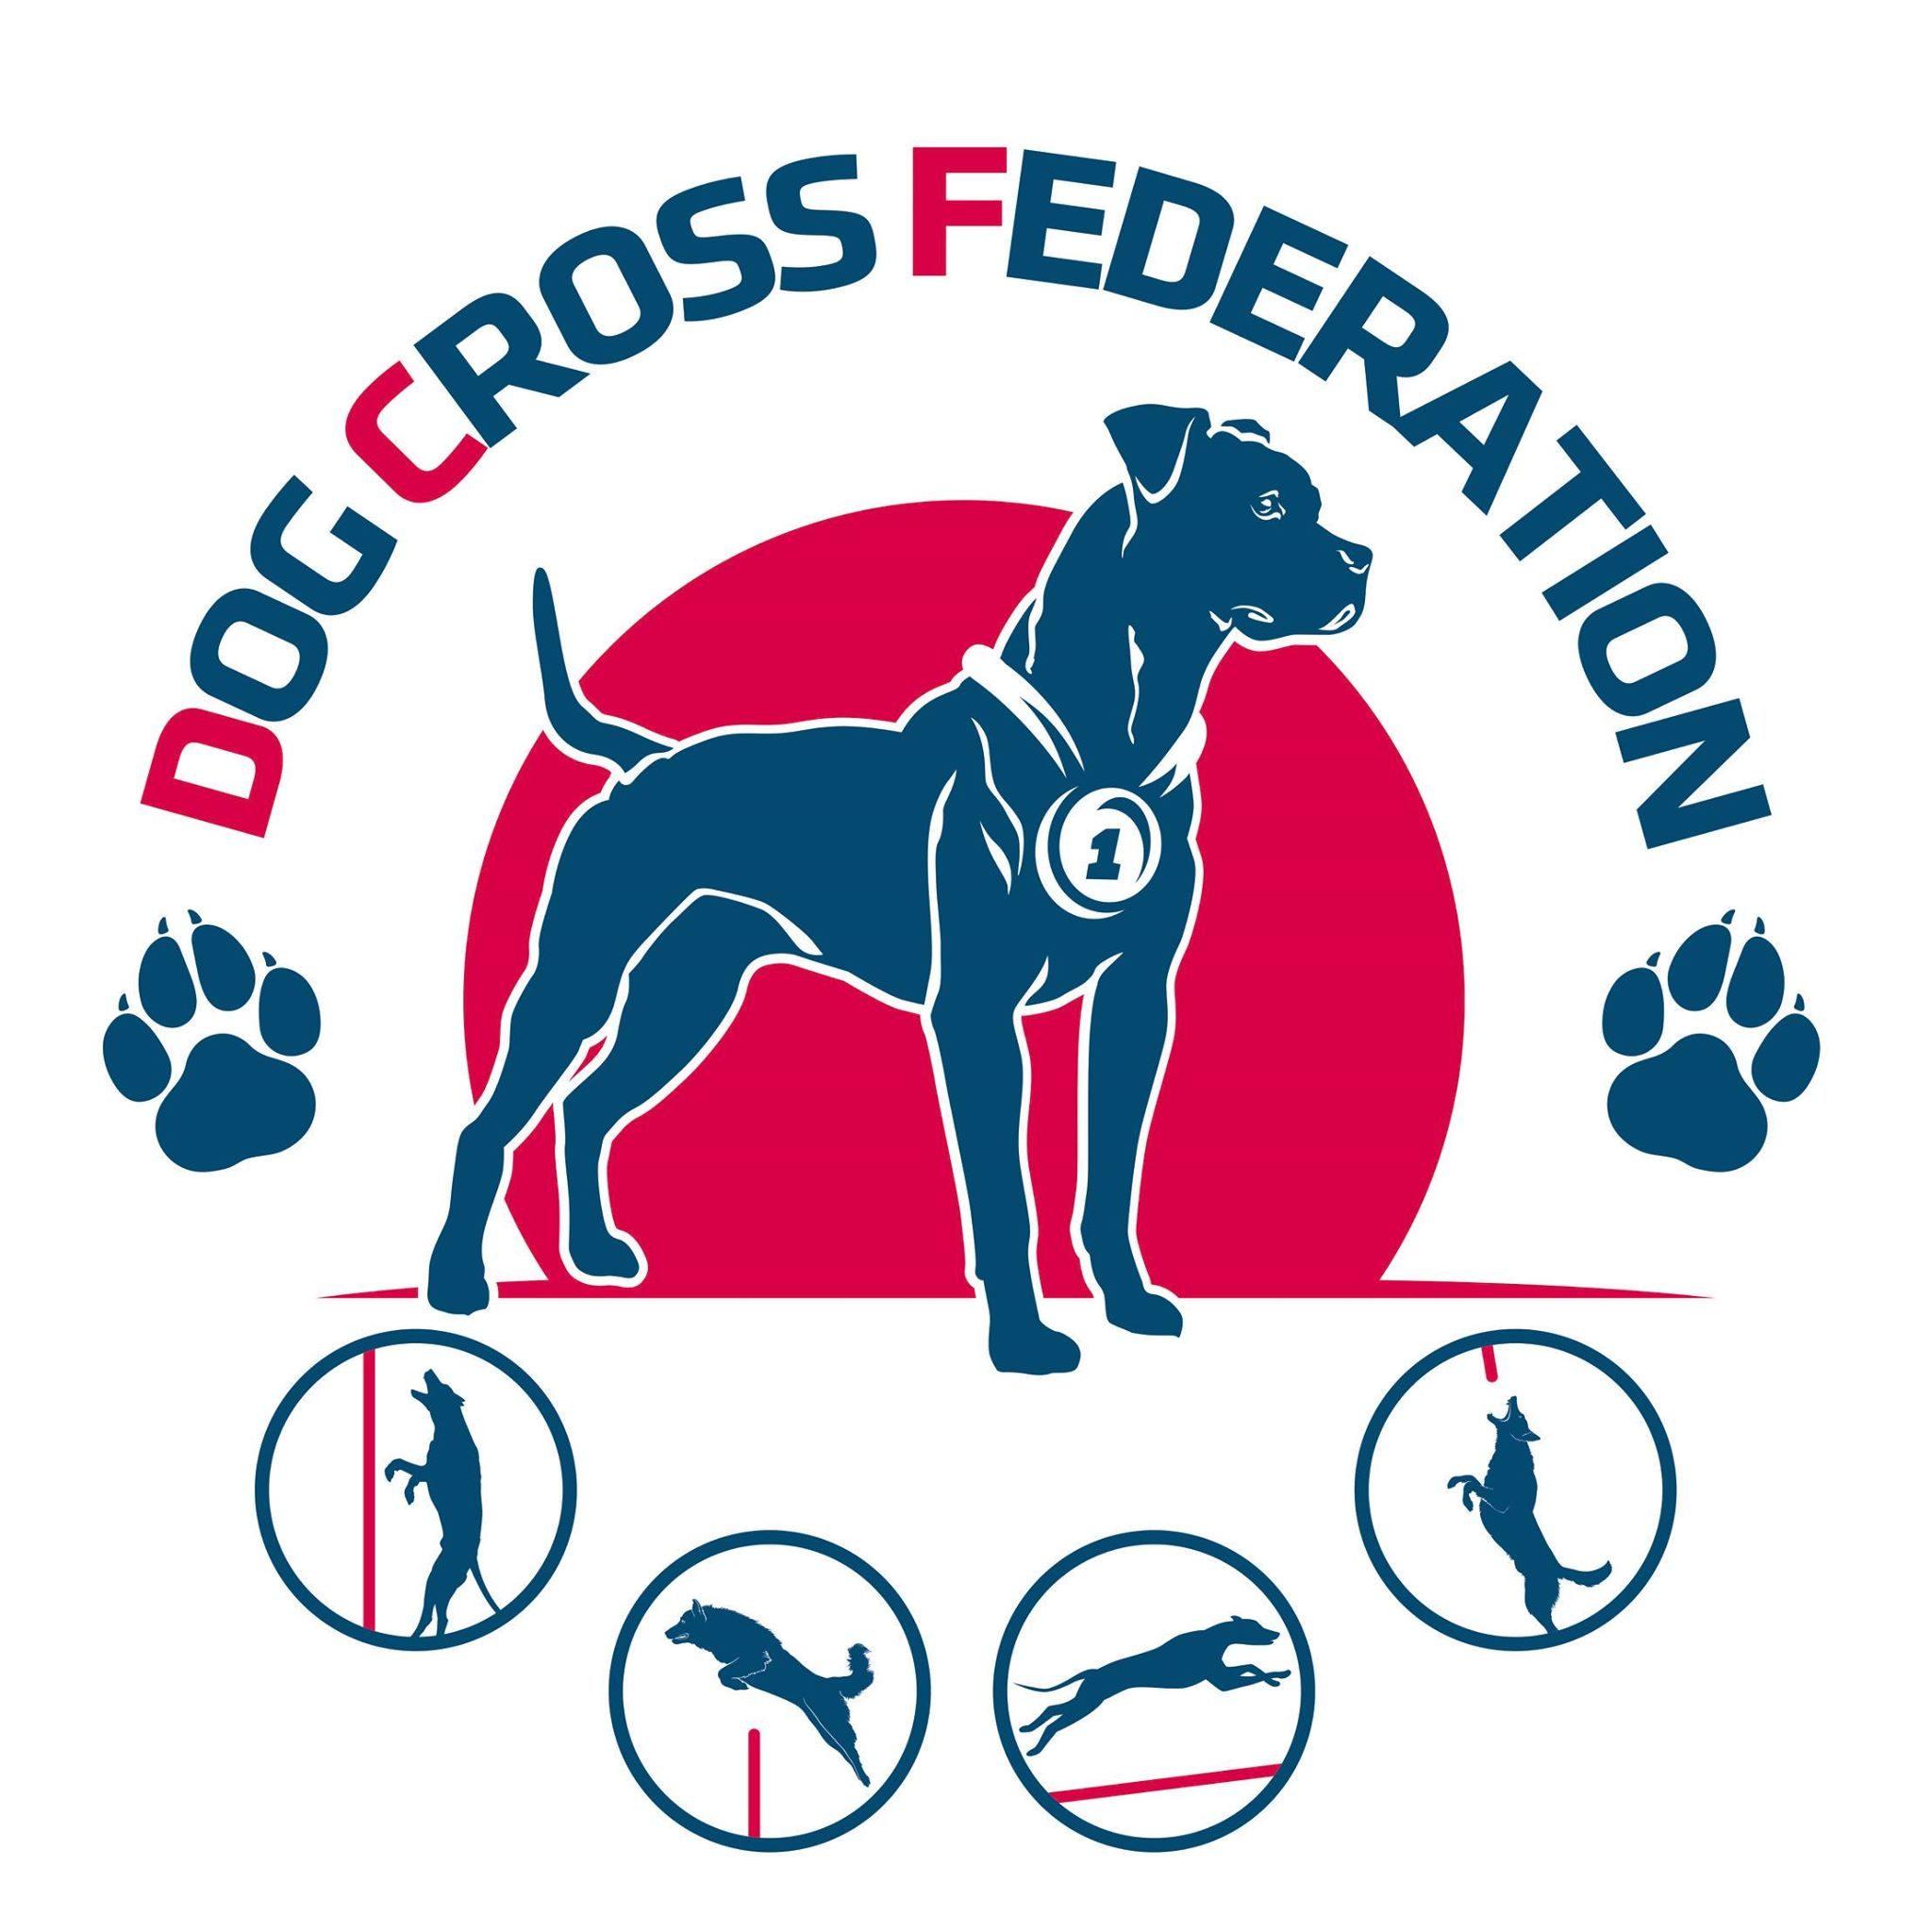 Dog Cross Federation